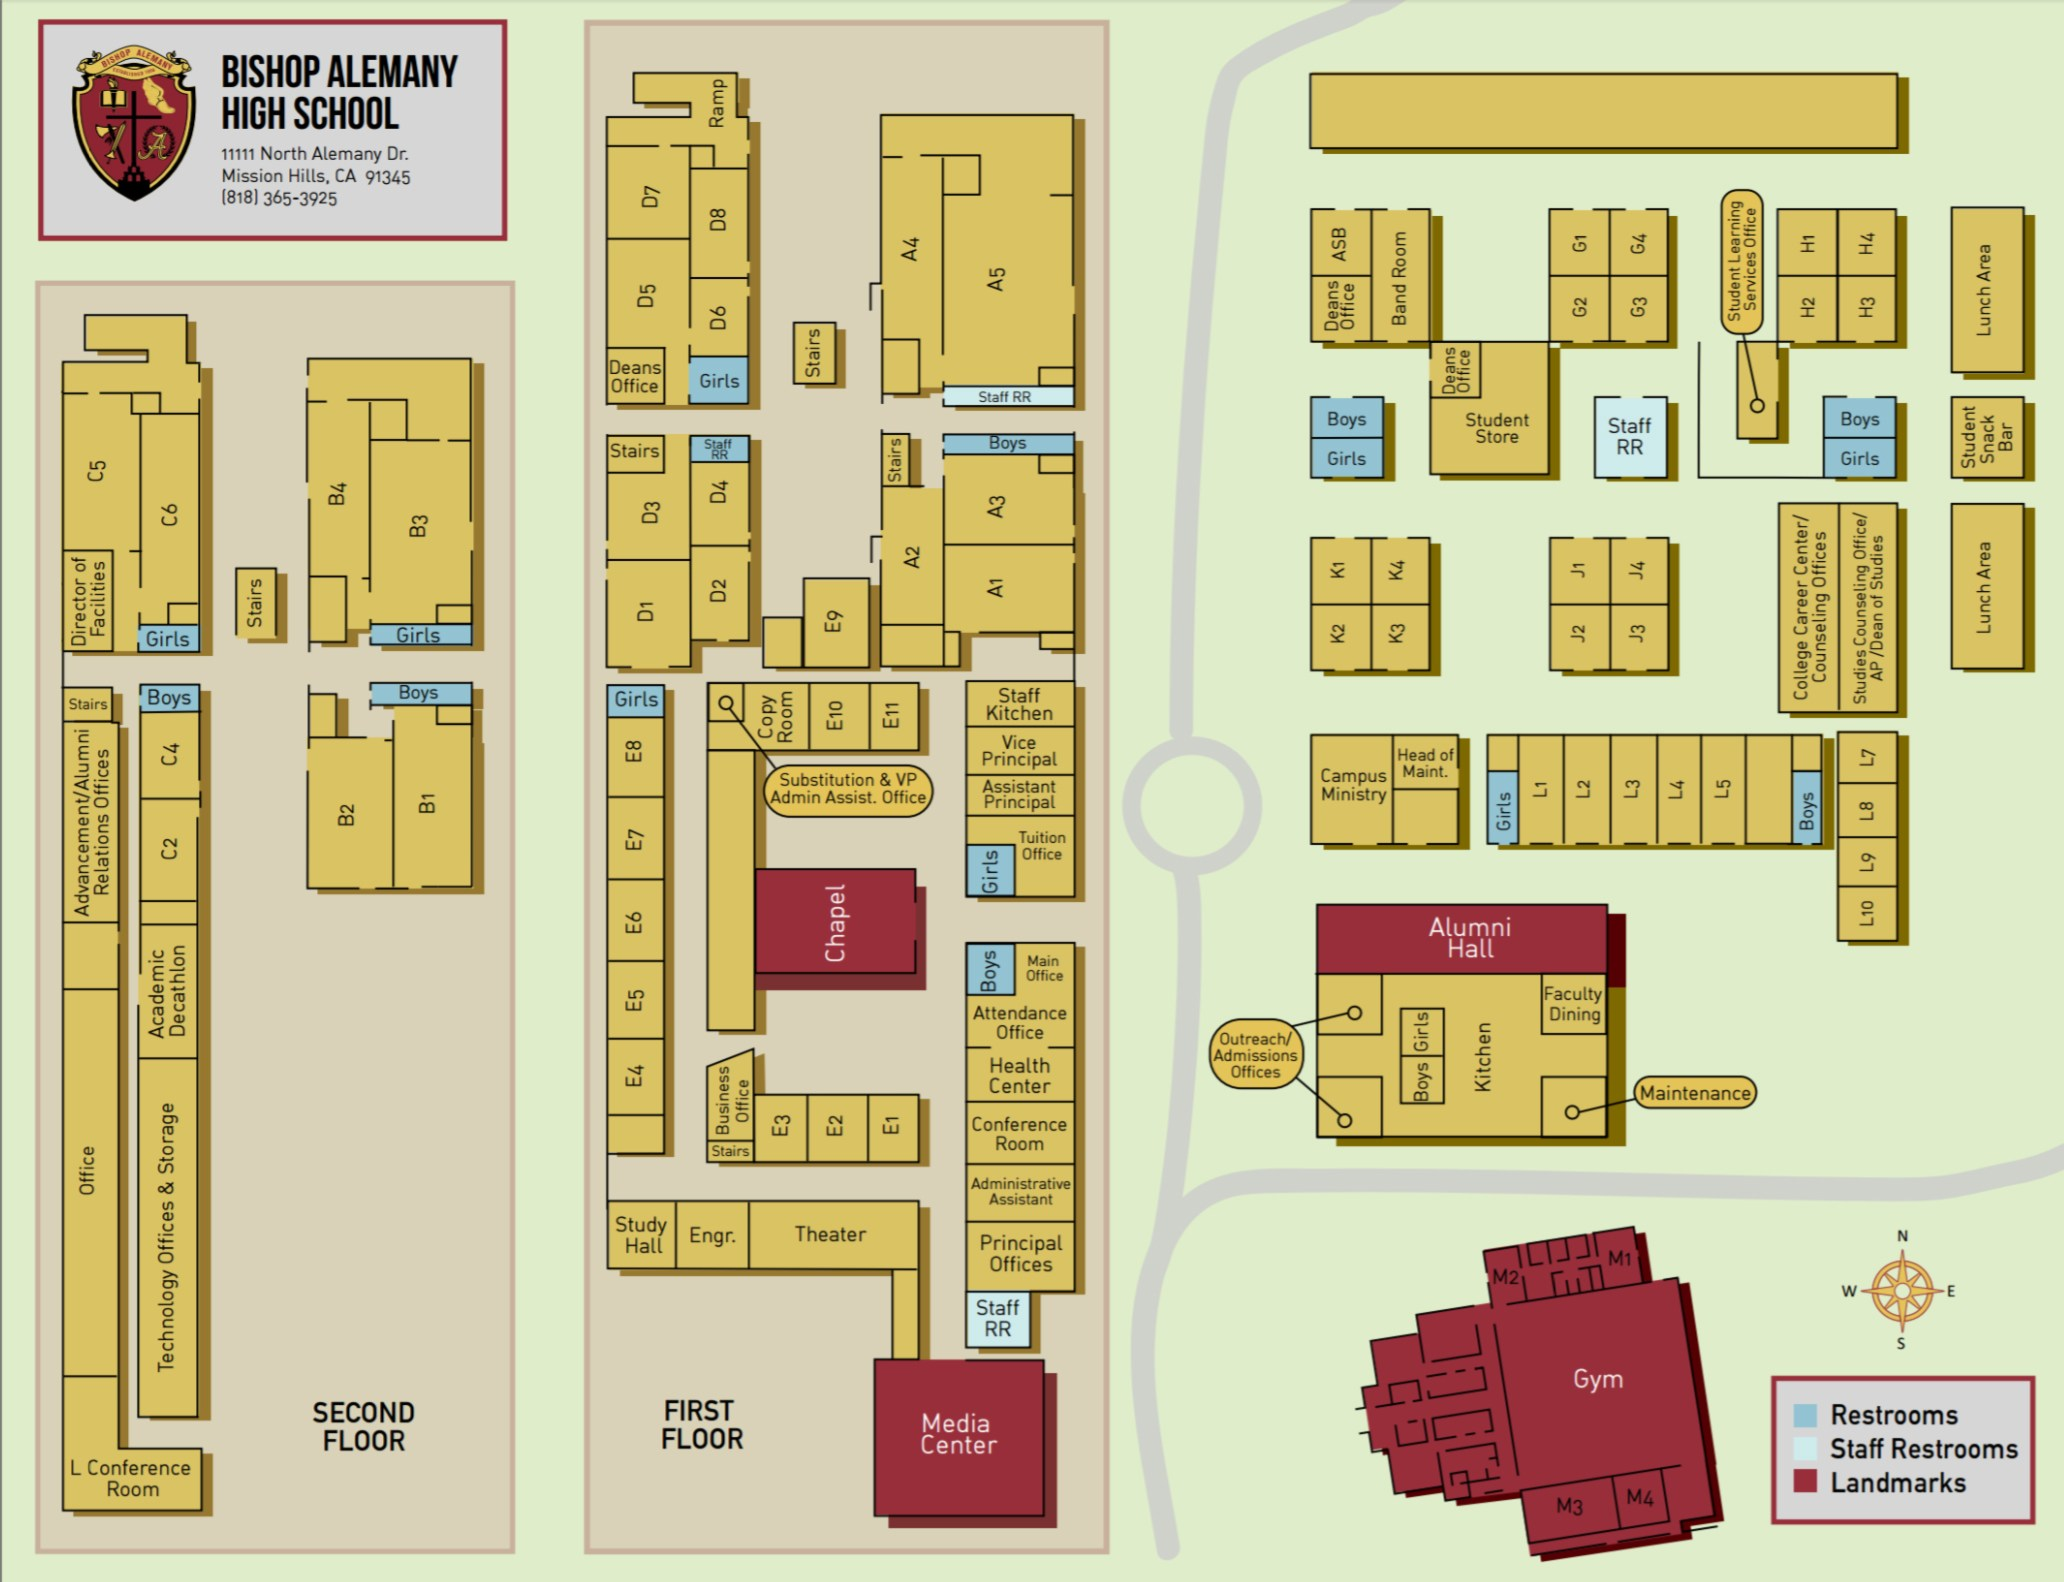 School Campus Map.Campus Map Directions Maps Bishop Alemany High School